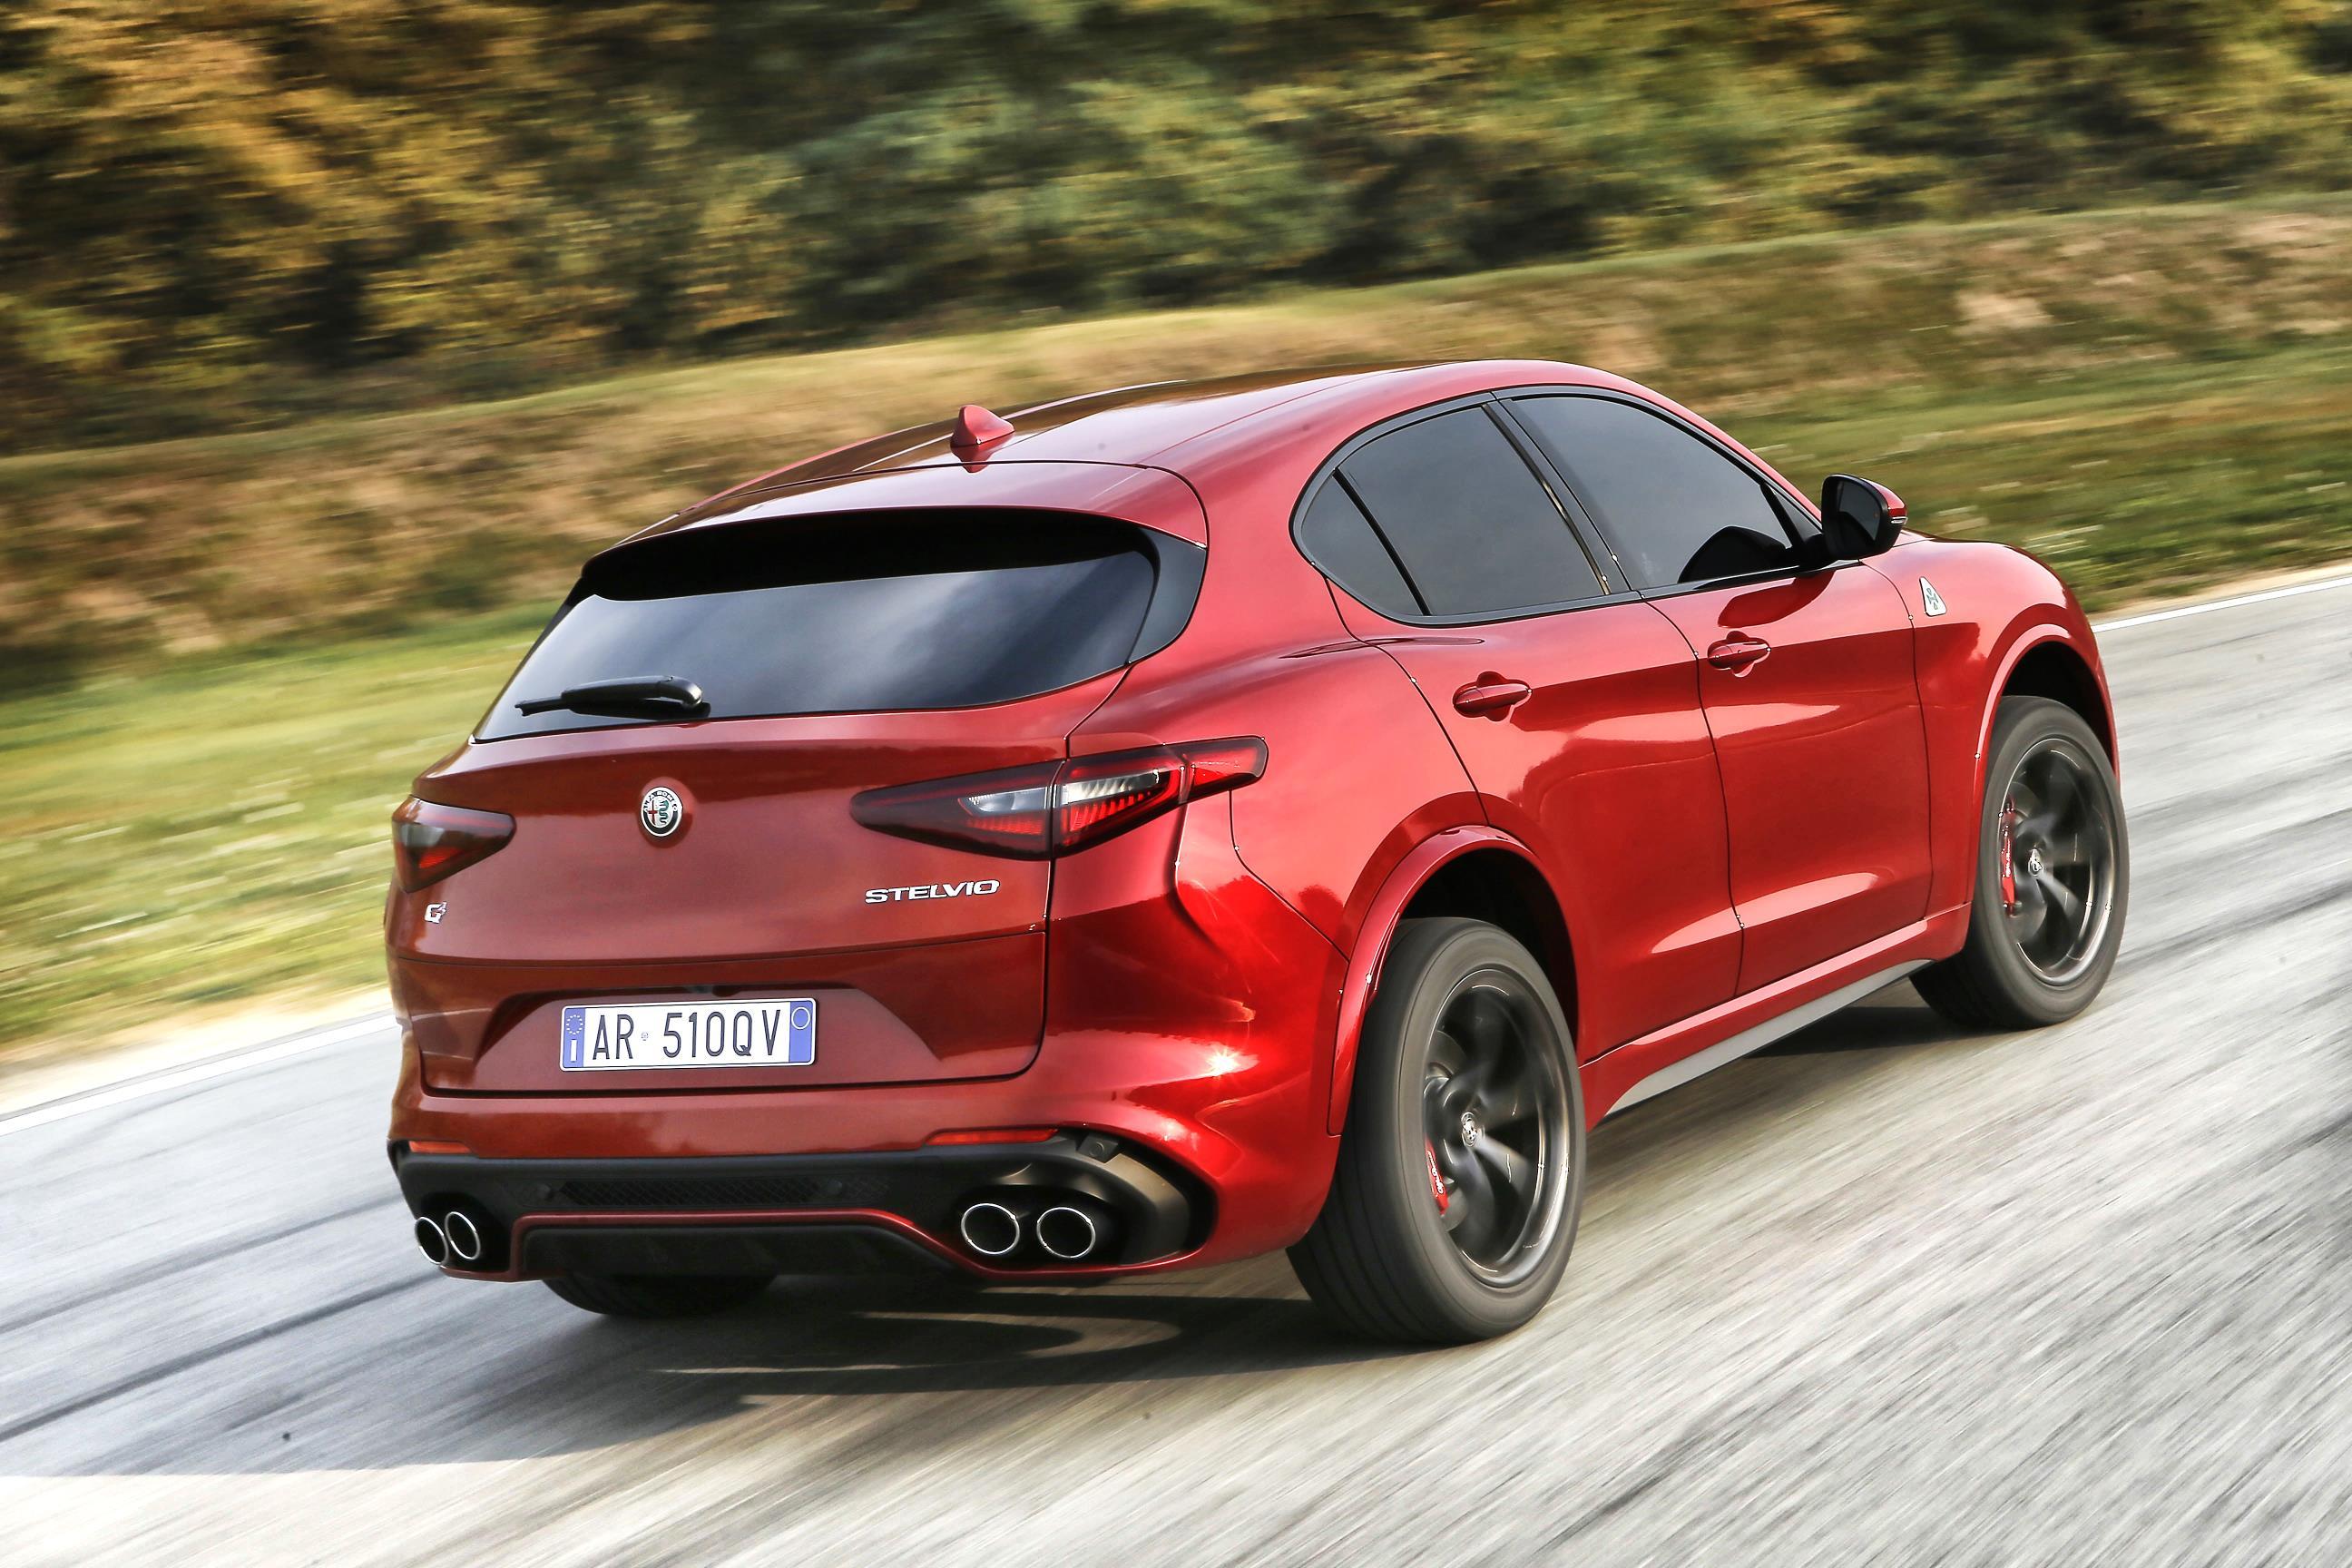 The New Alfa Romeo Stelvio Quadrifoglio The Leader Newspaper